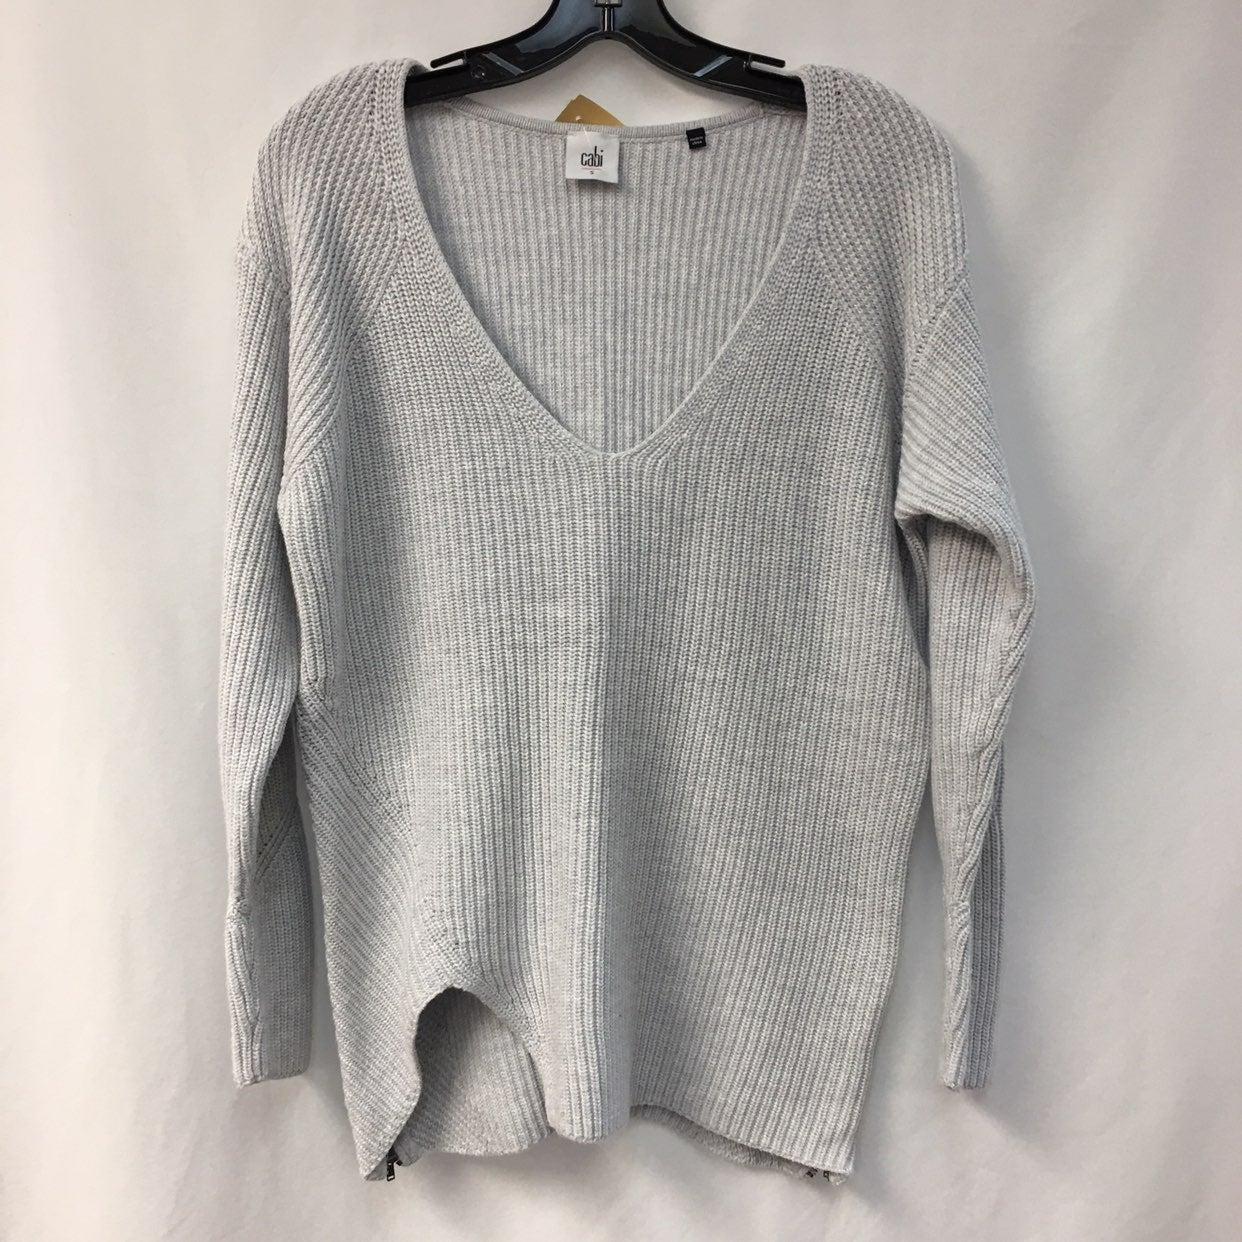 Cabi gray sweater size small